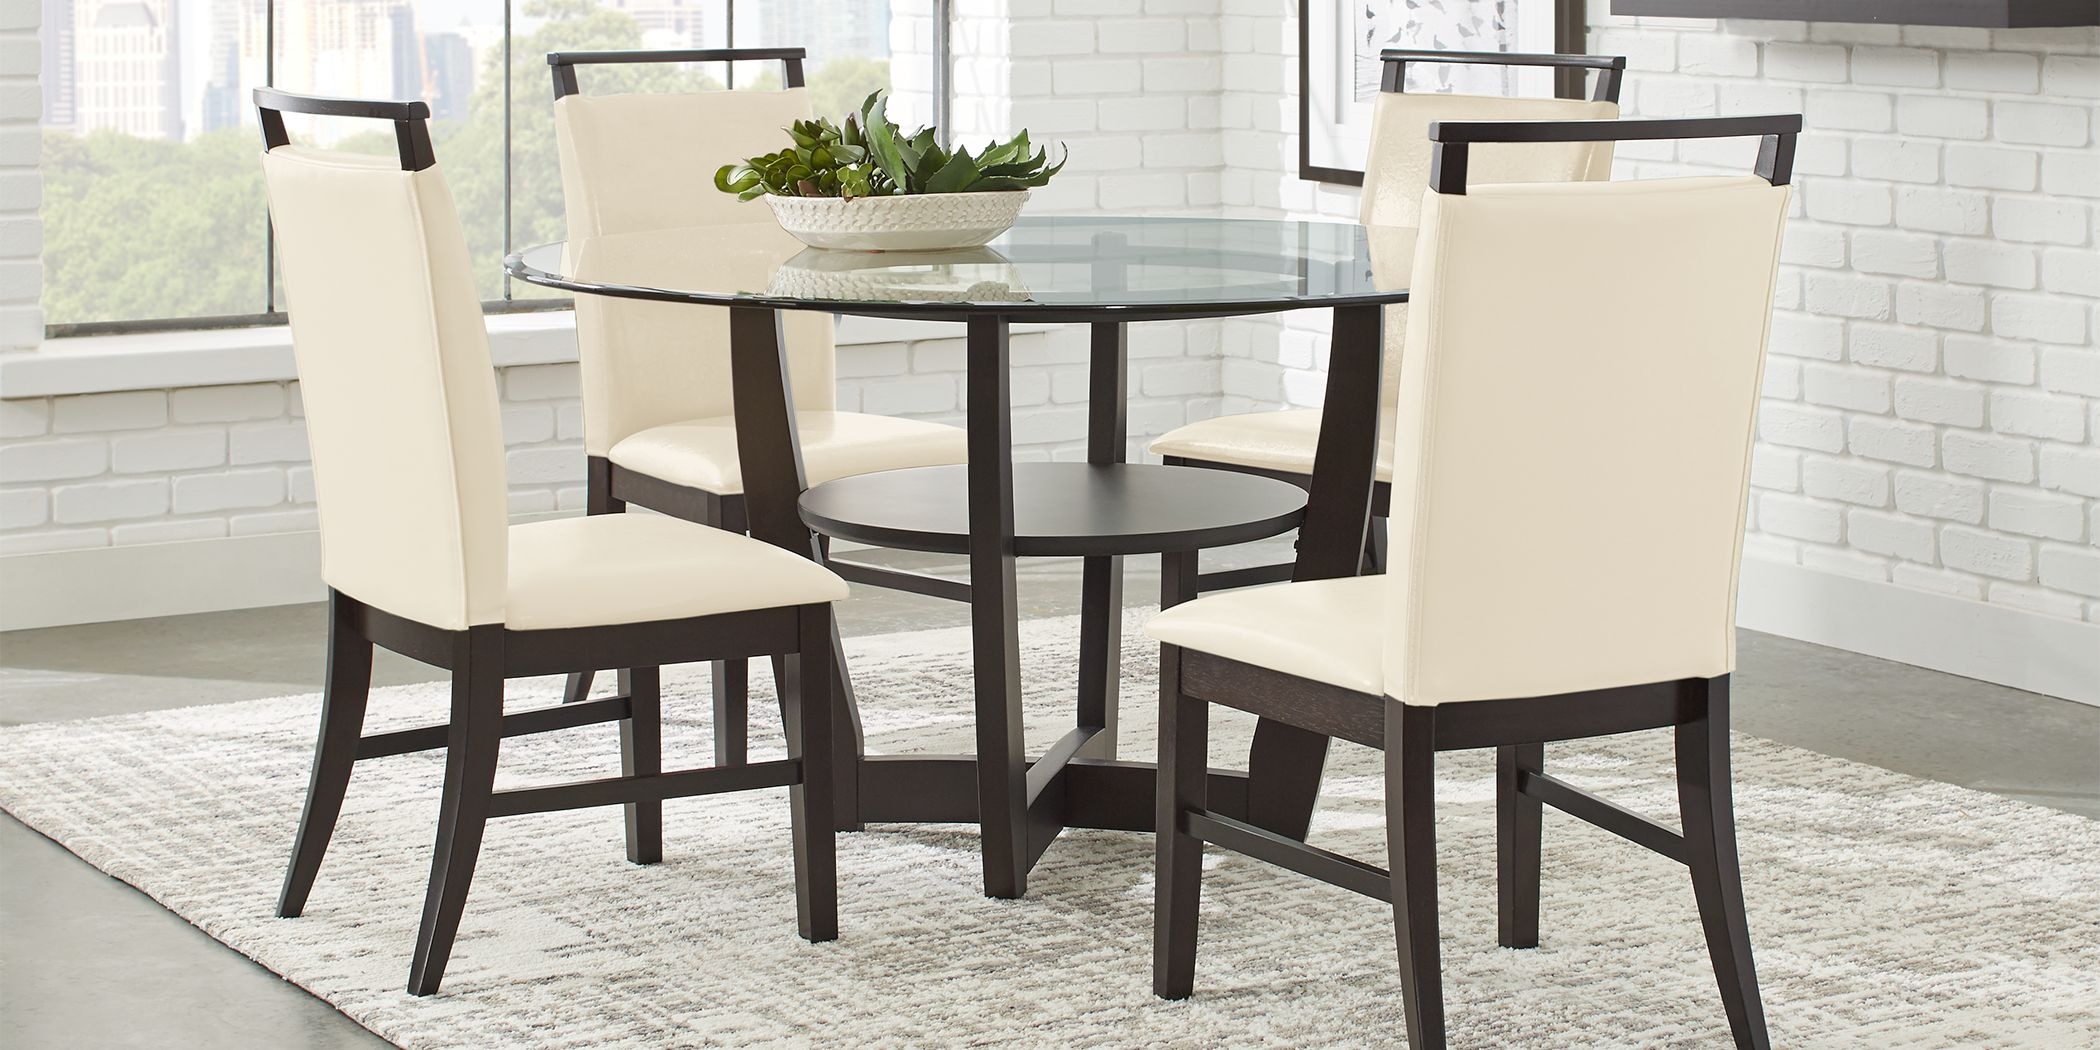 "Ciara Espresso 5 Pc 48"" Round Dining Set with Cream Chairs"